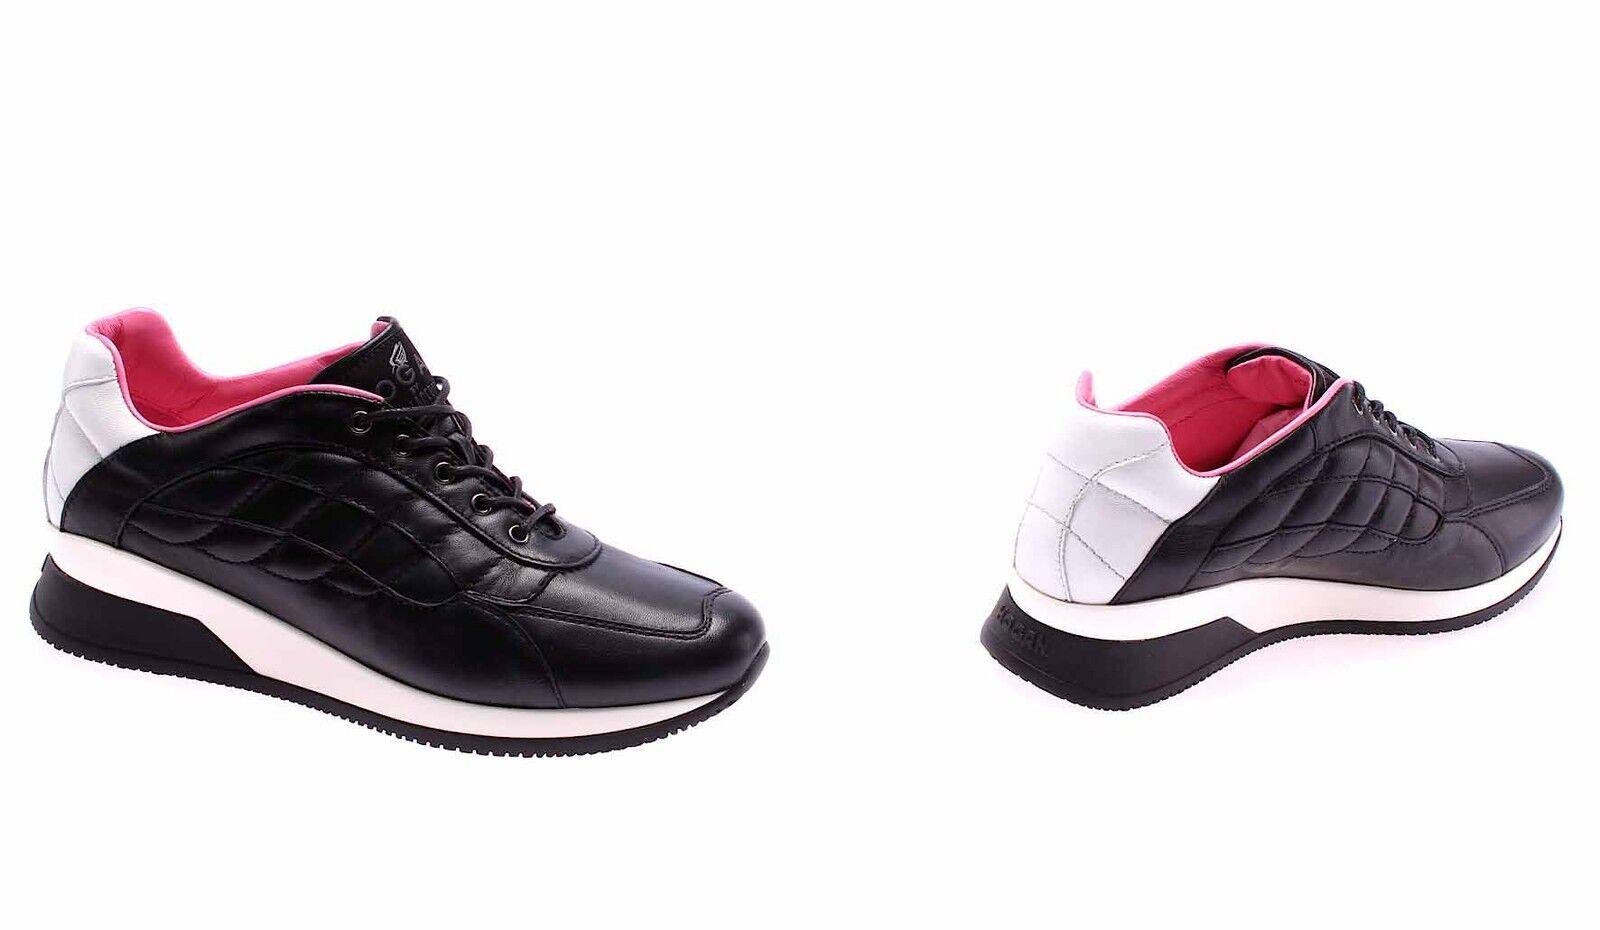 Damen Schuhe Schwarz Sneakers HOGAN BY KARL LAGERFELD Elective Schwarz Schuhe Luxus Made  69c9e2